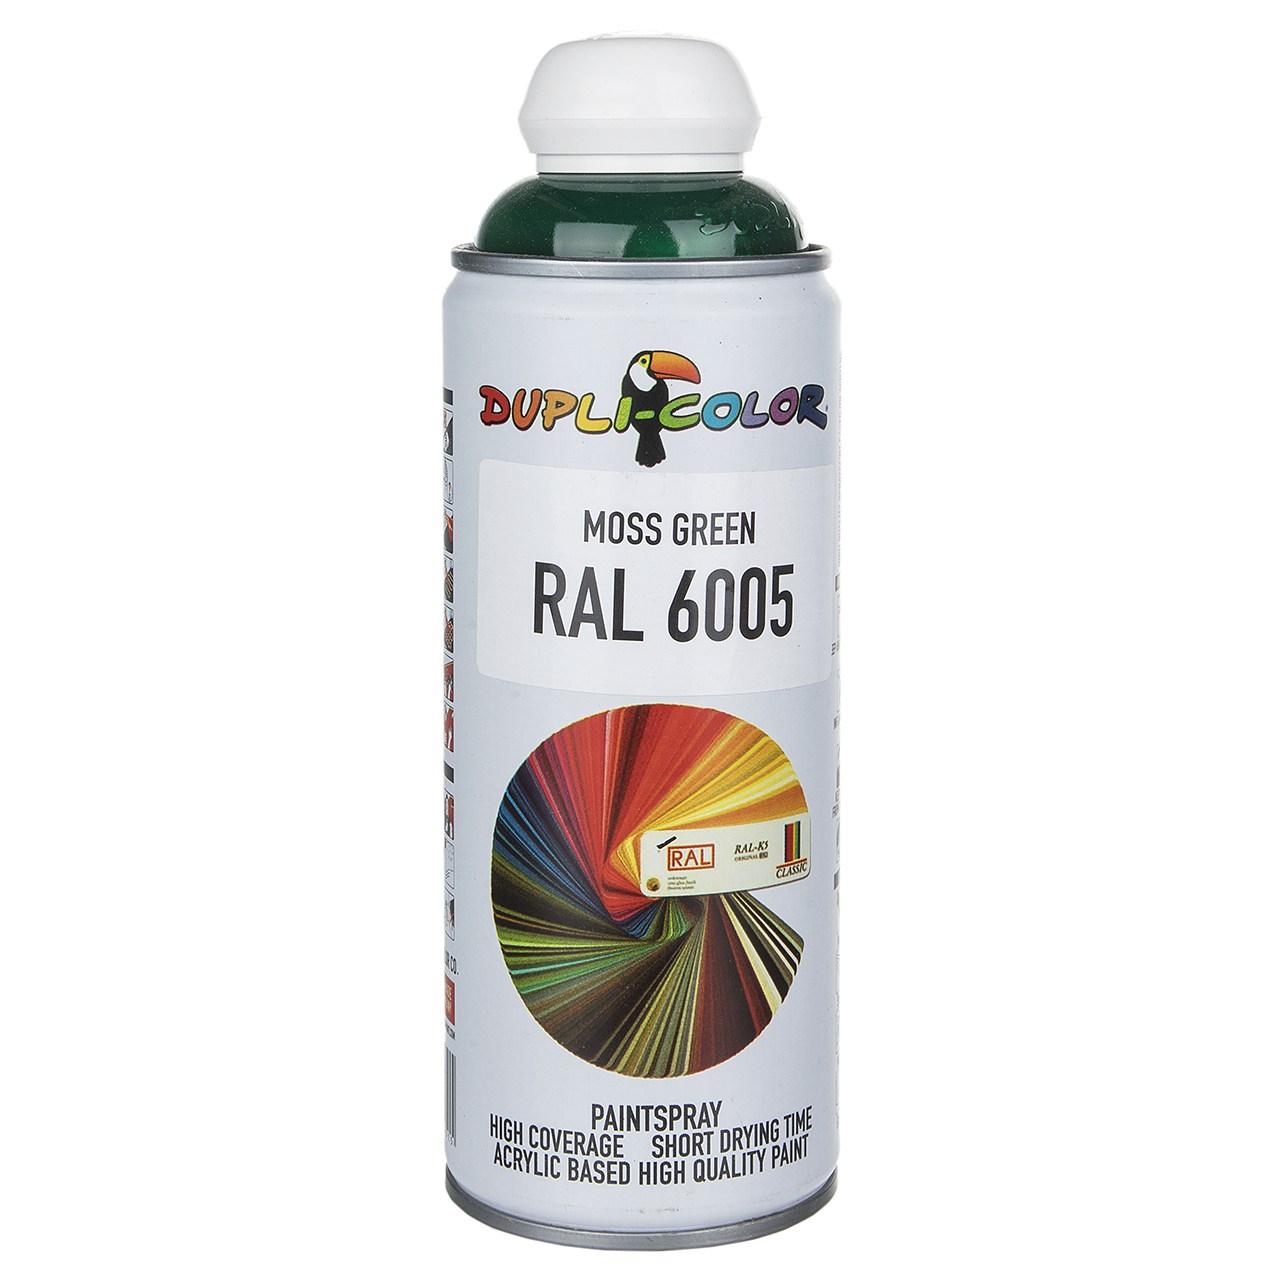 اسپری رنگ سبز دوپلی کالر مدل RAL 6005 حجم 400 میلی لیتر